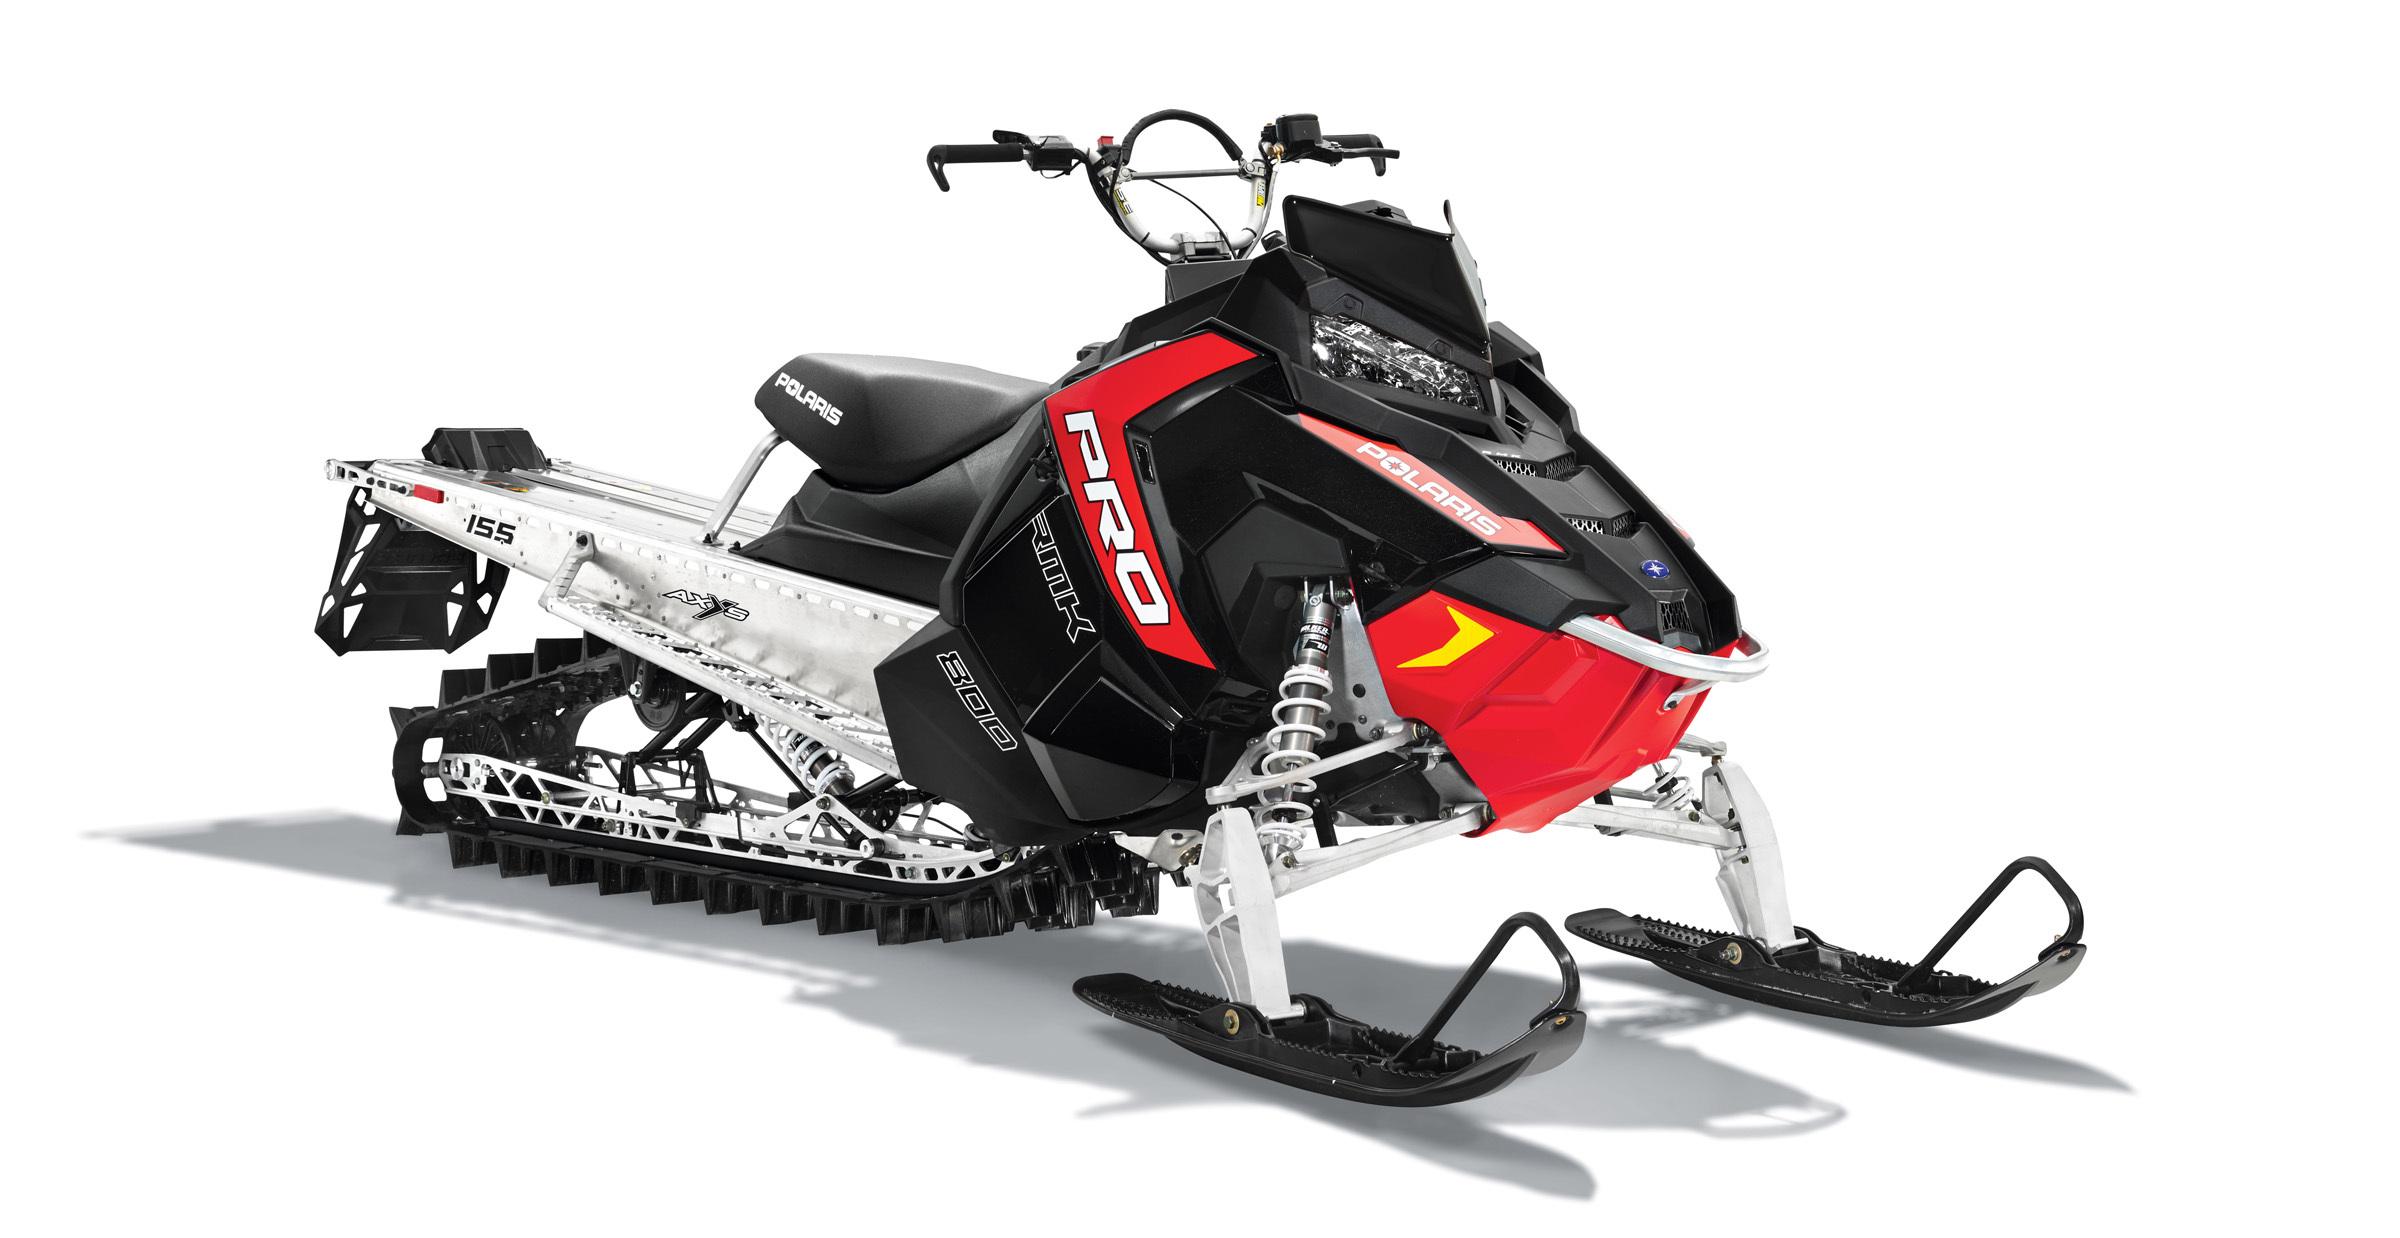 Arctic Cat releases 2016 snowmobiles - American Snowmobiler ...